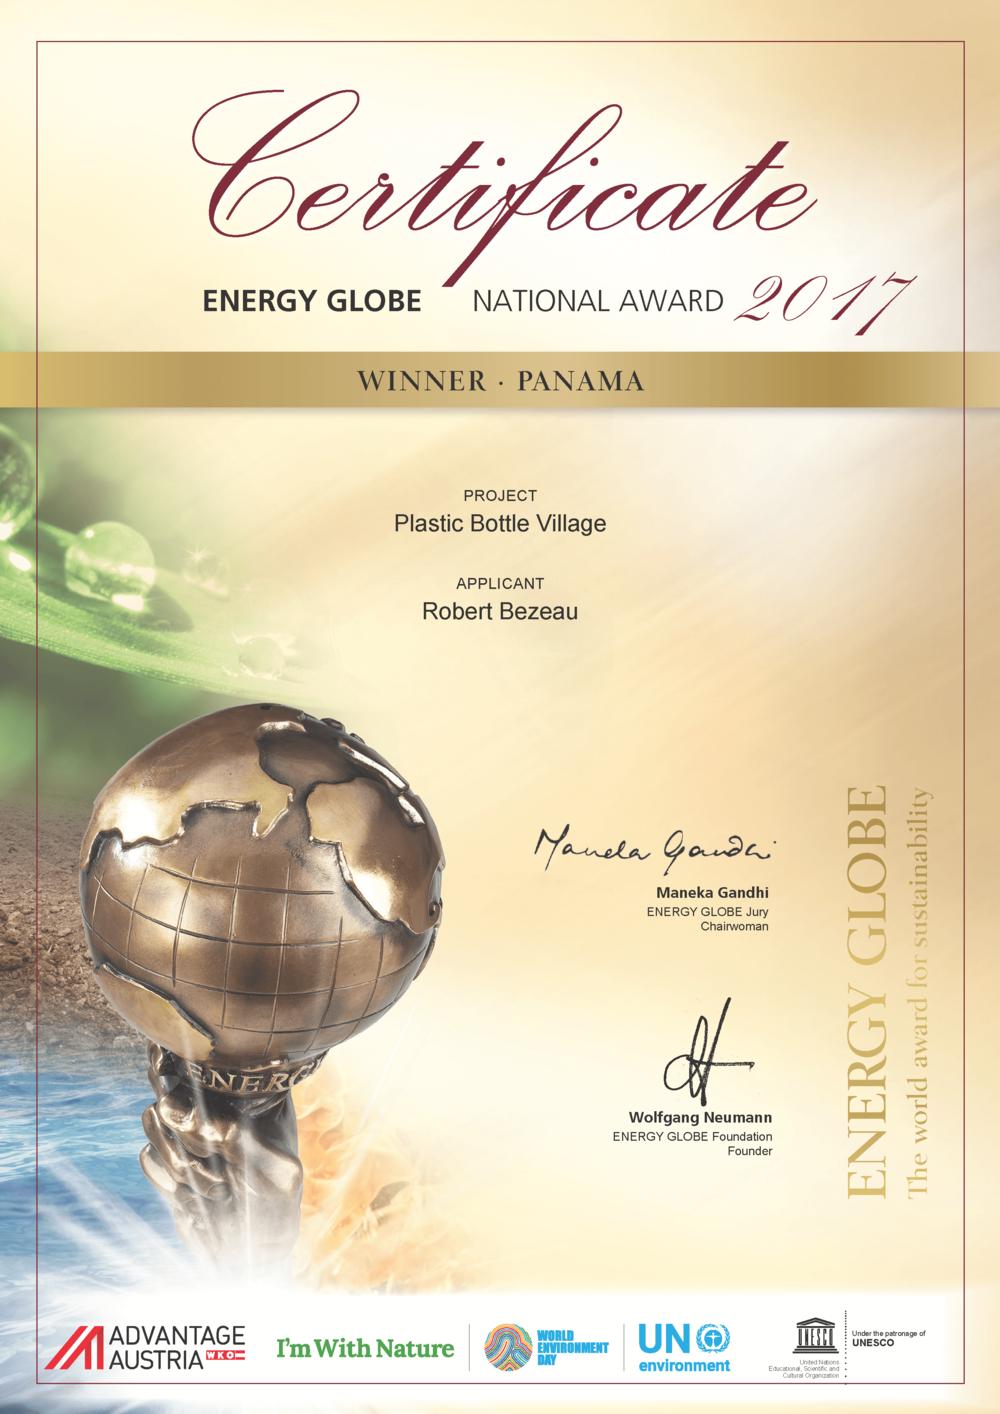 A Panama_NationalEnergyGlobe (1).png